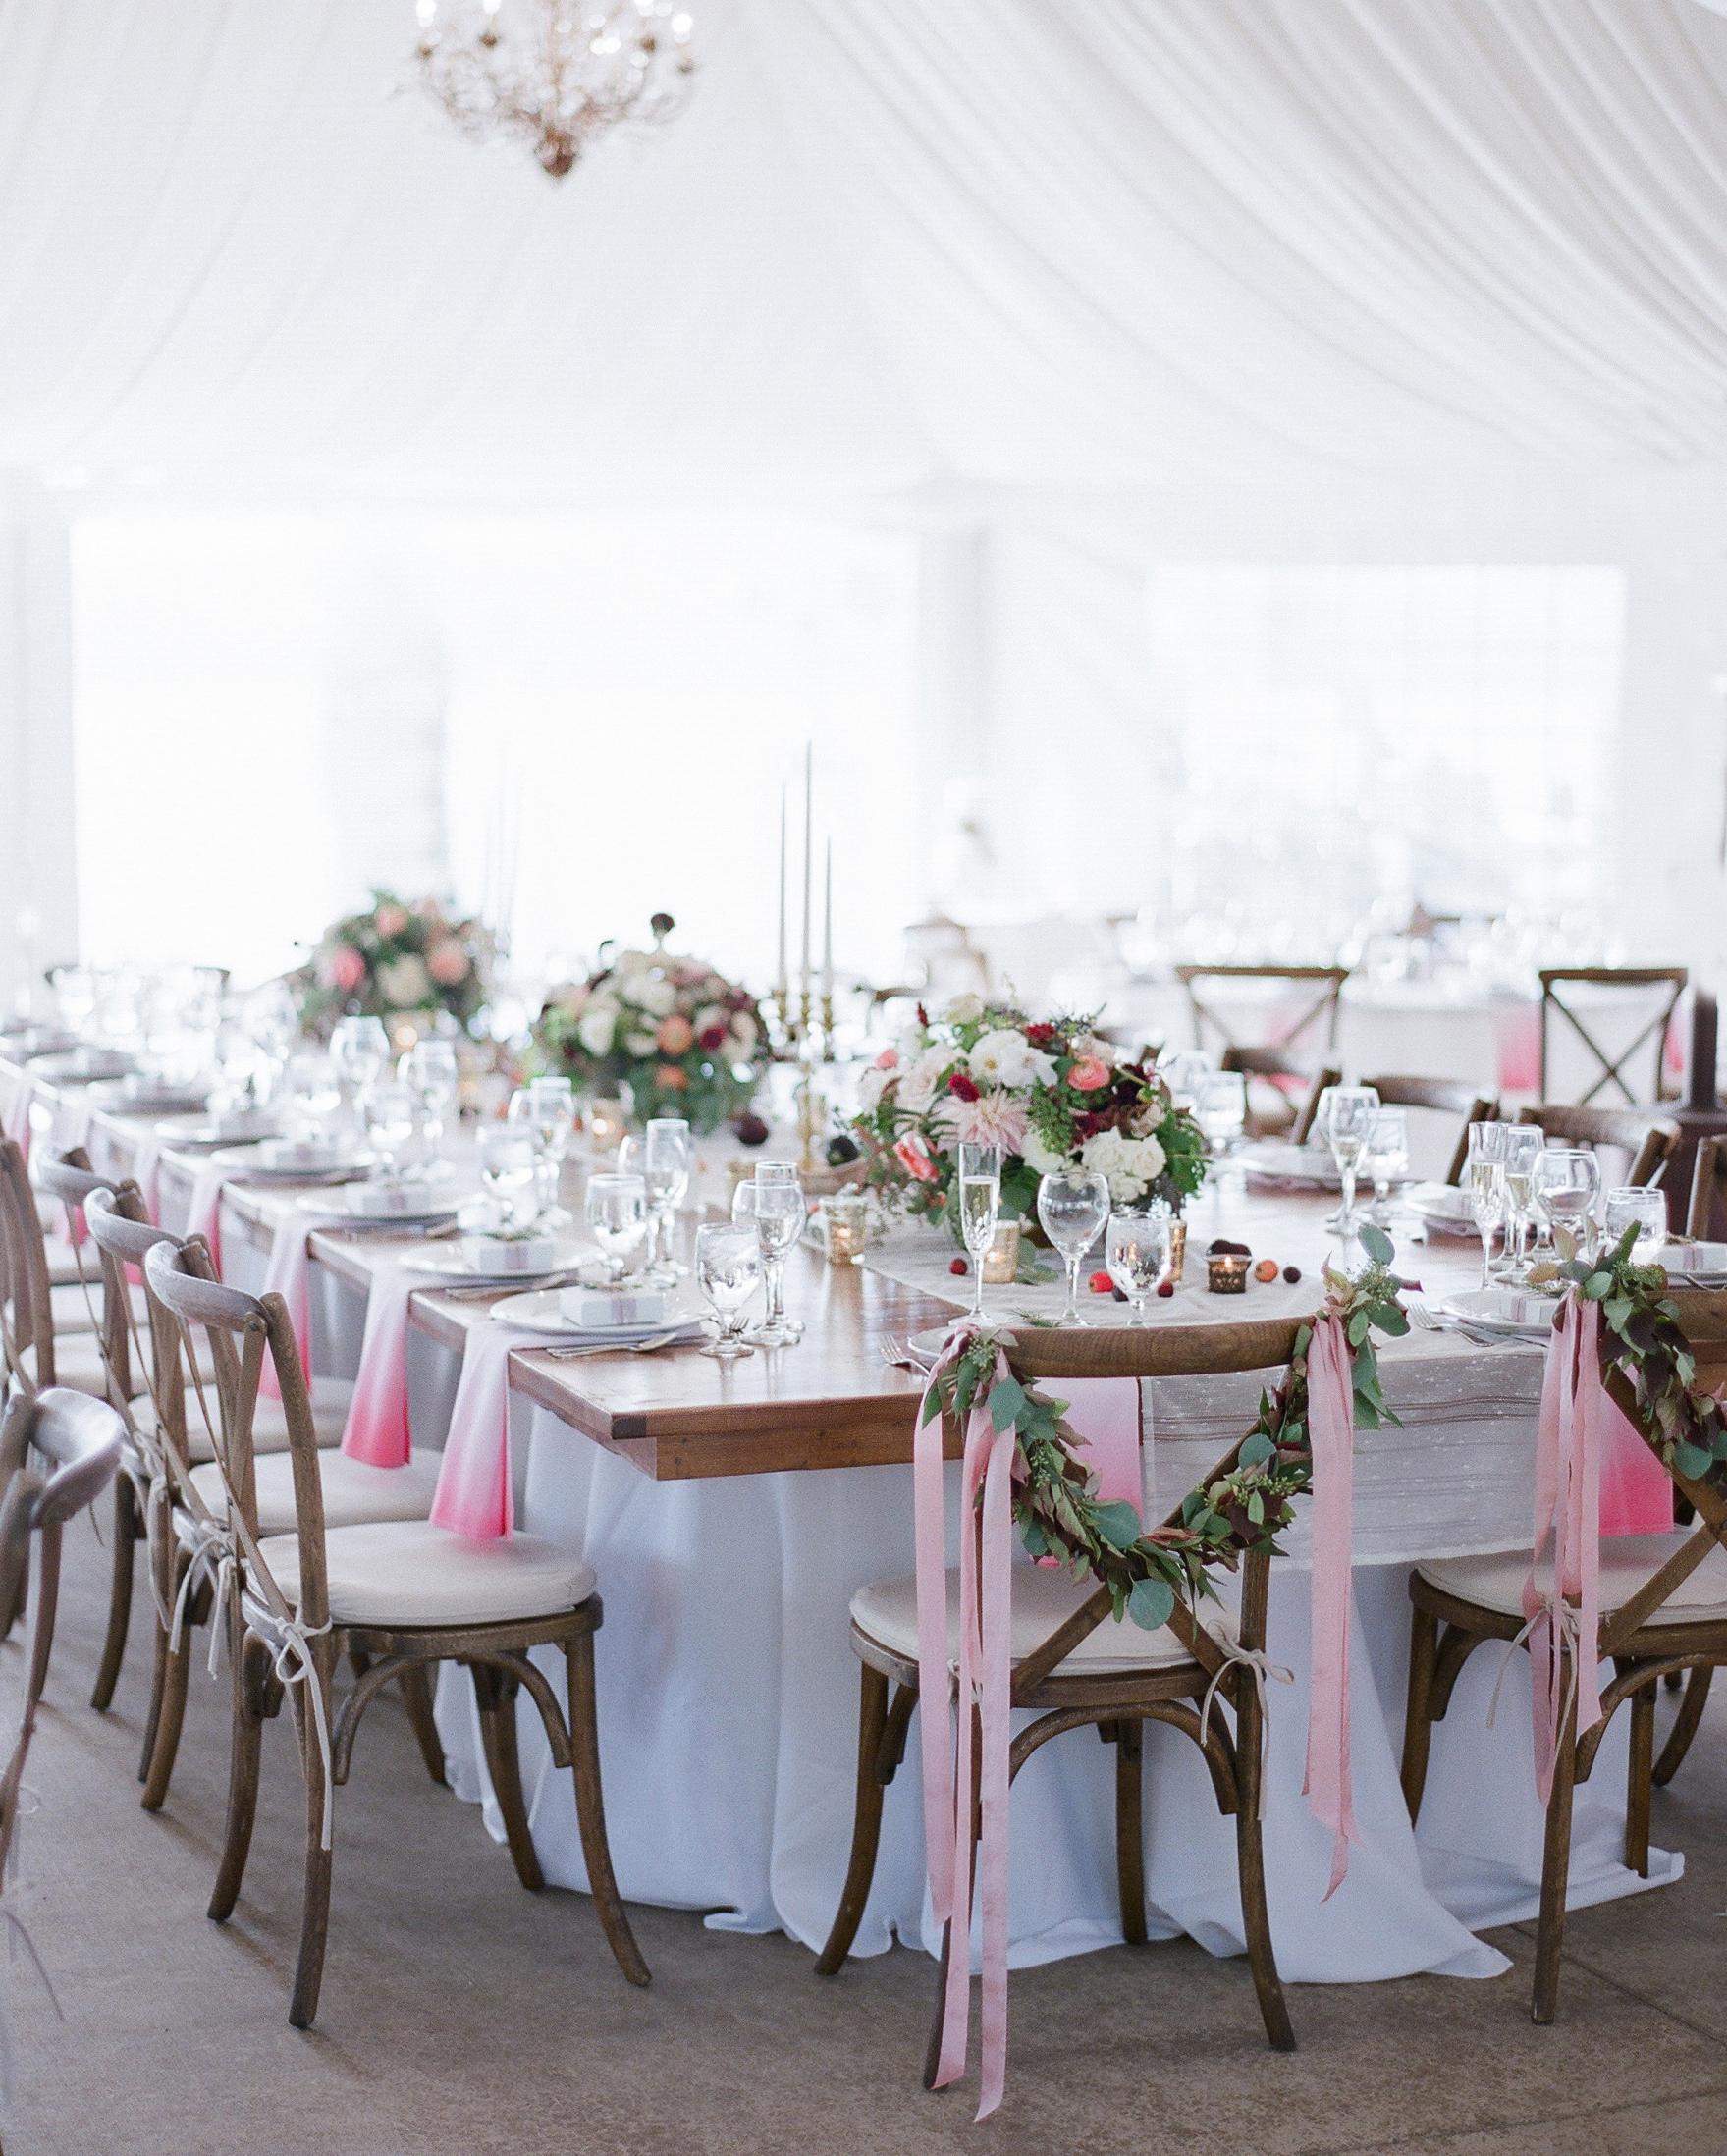 robin-kenny-wedding-tables-006-s112068-0715.jpg